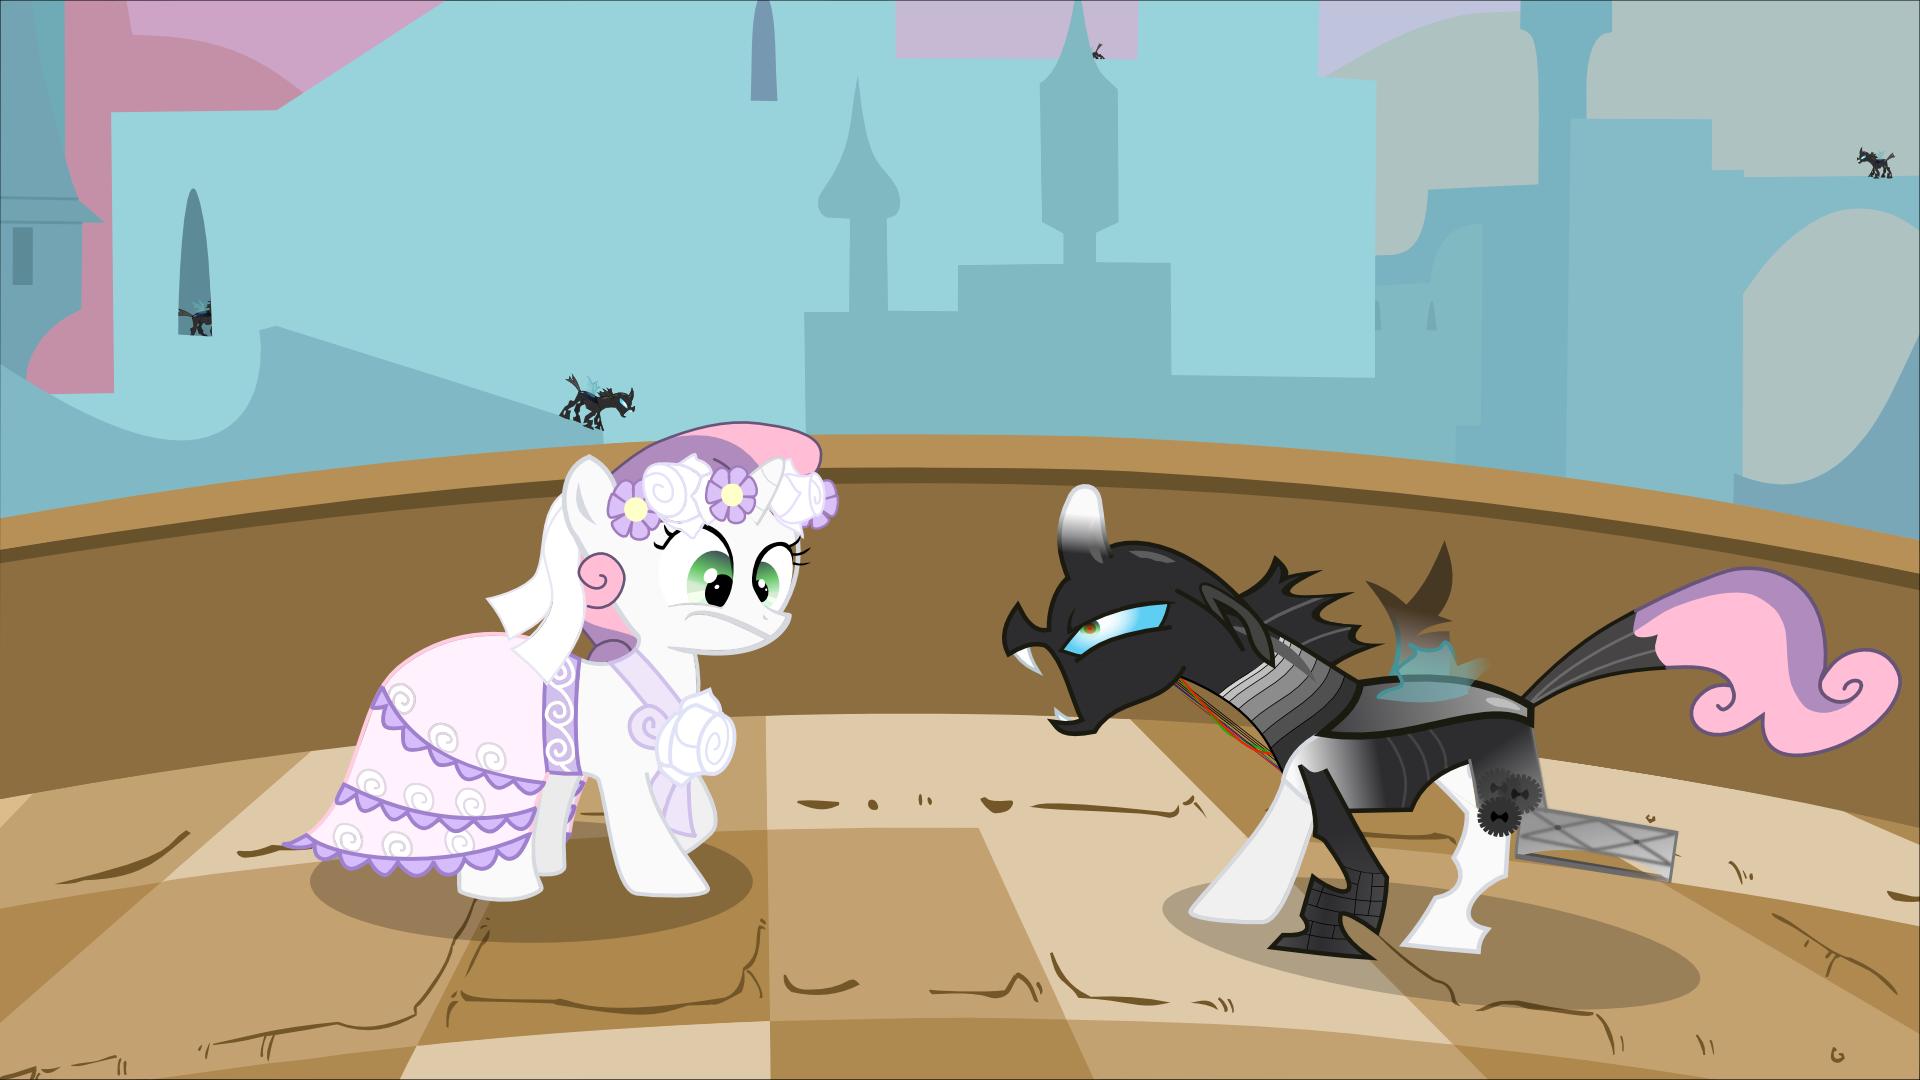 Sweetie Bot meets Changeling by Serendipony on DeviantArt